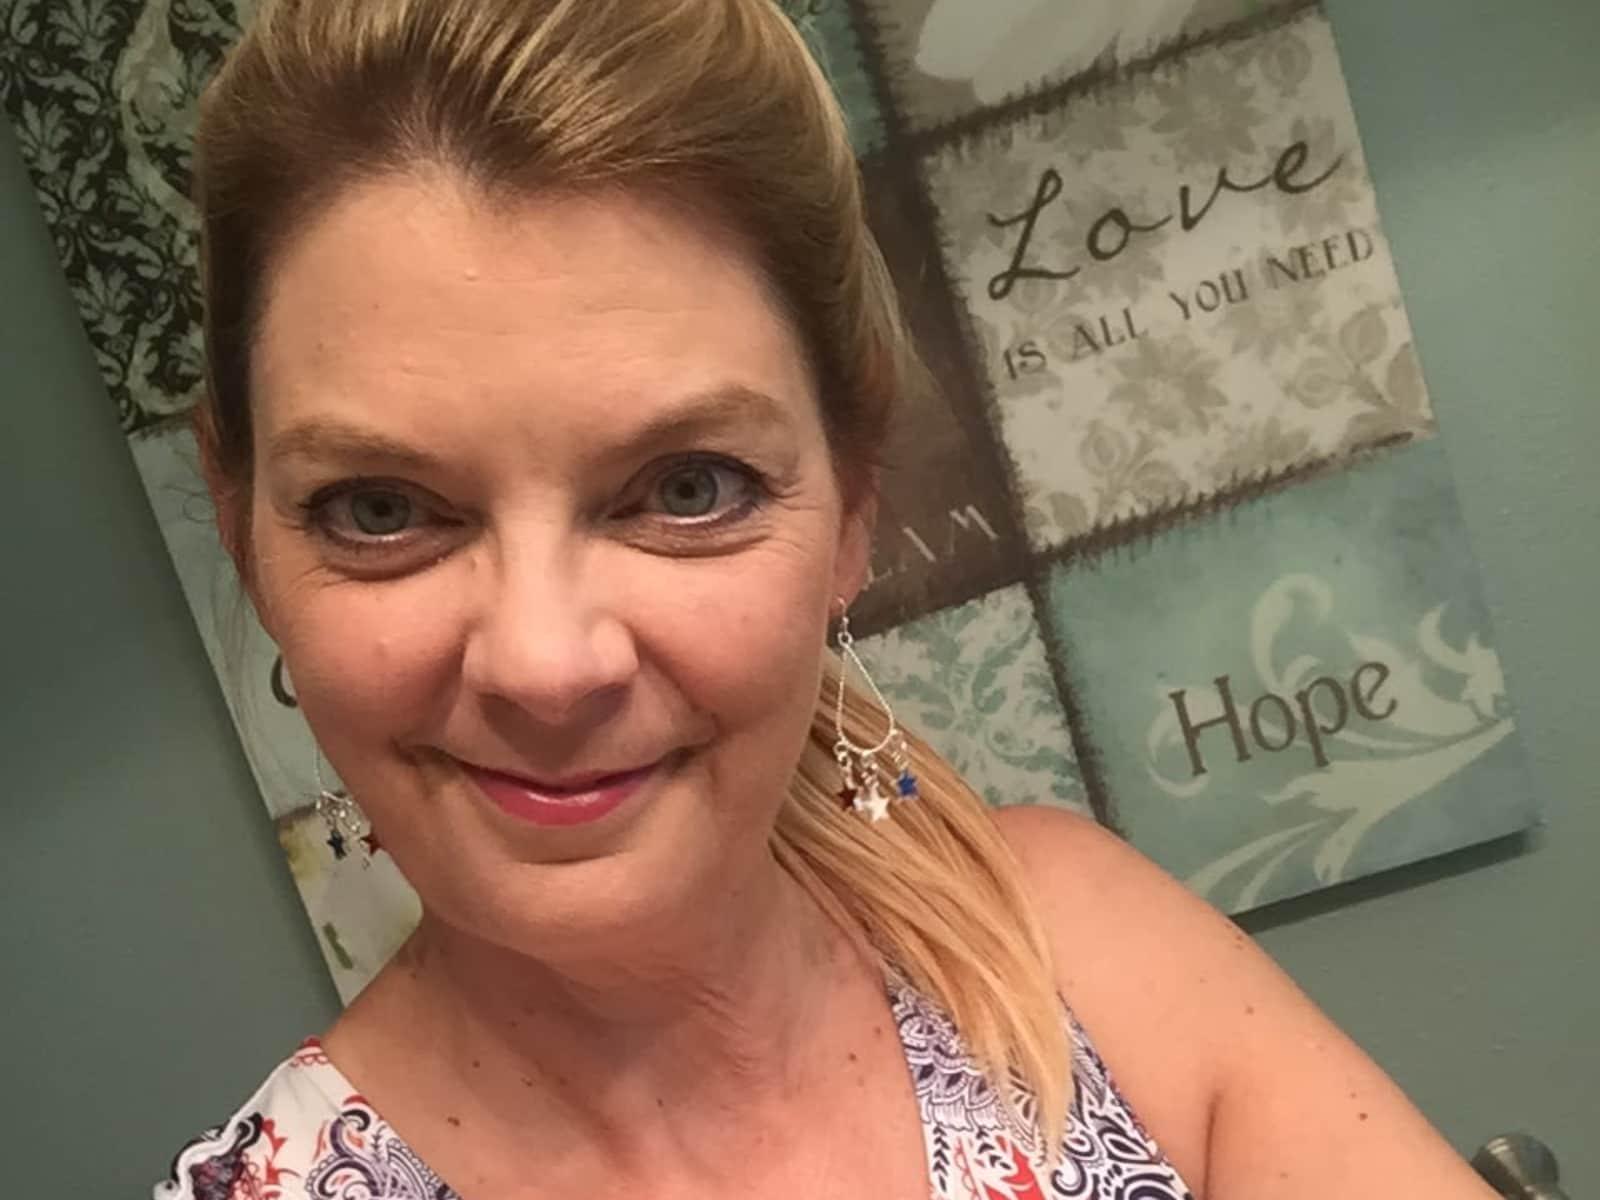 Linda from Houston, Texas, United States